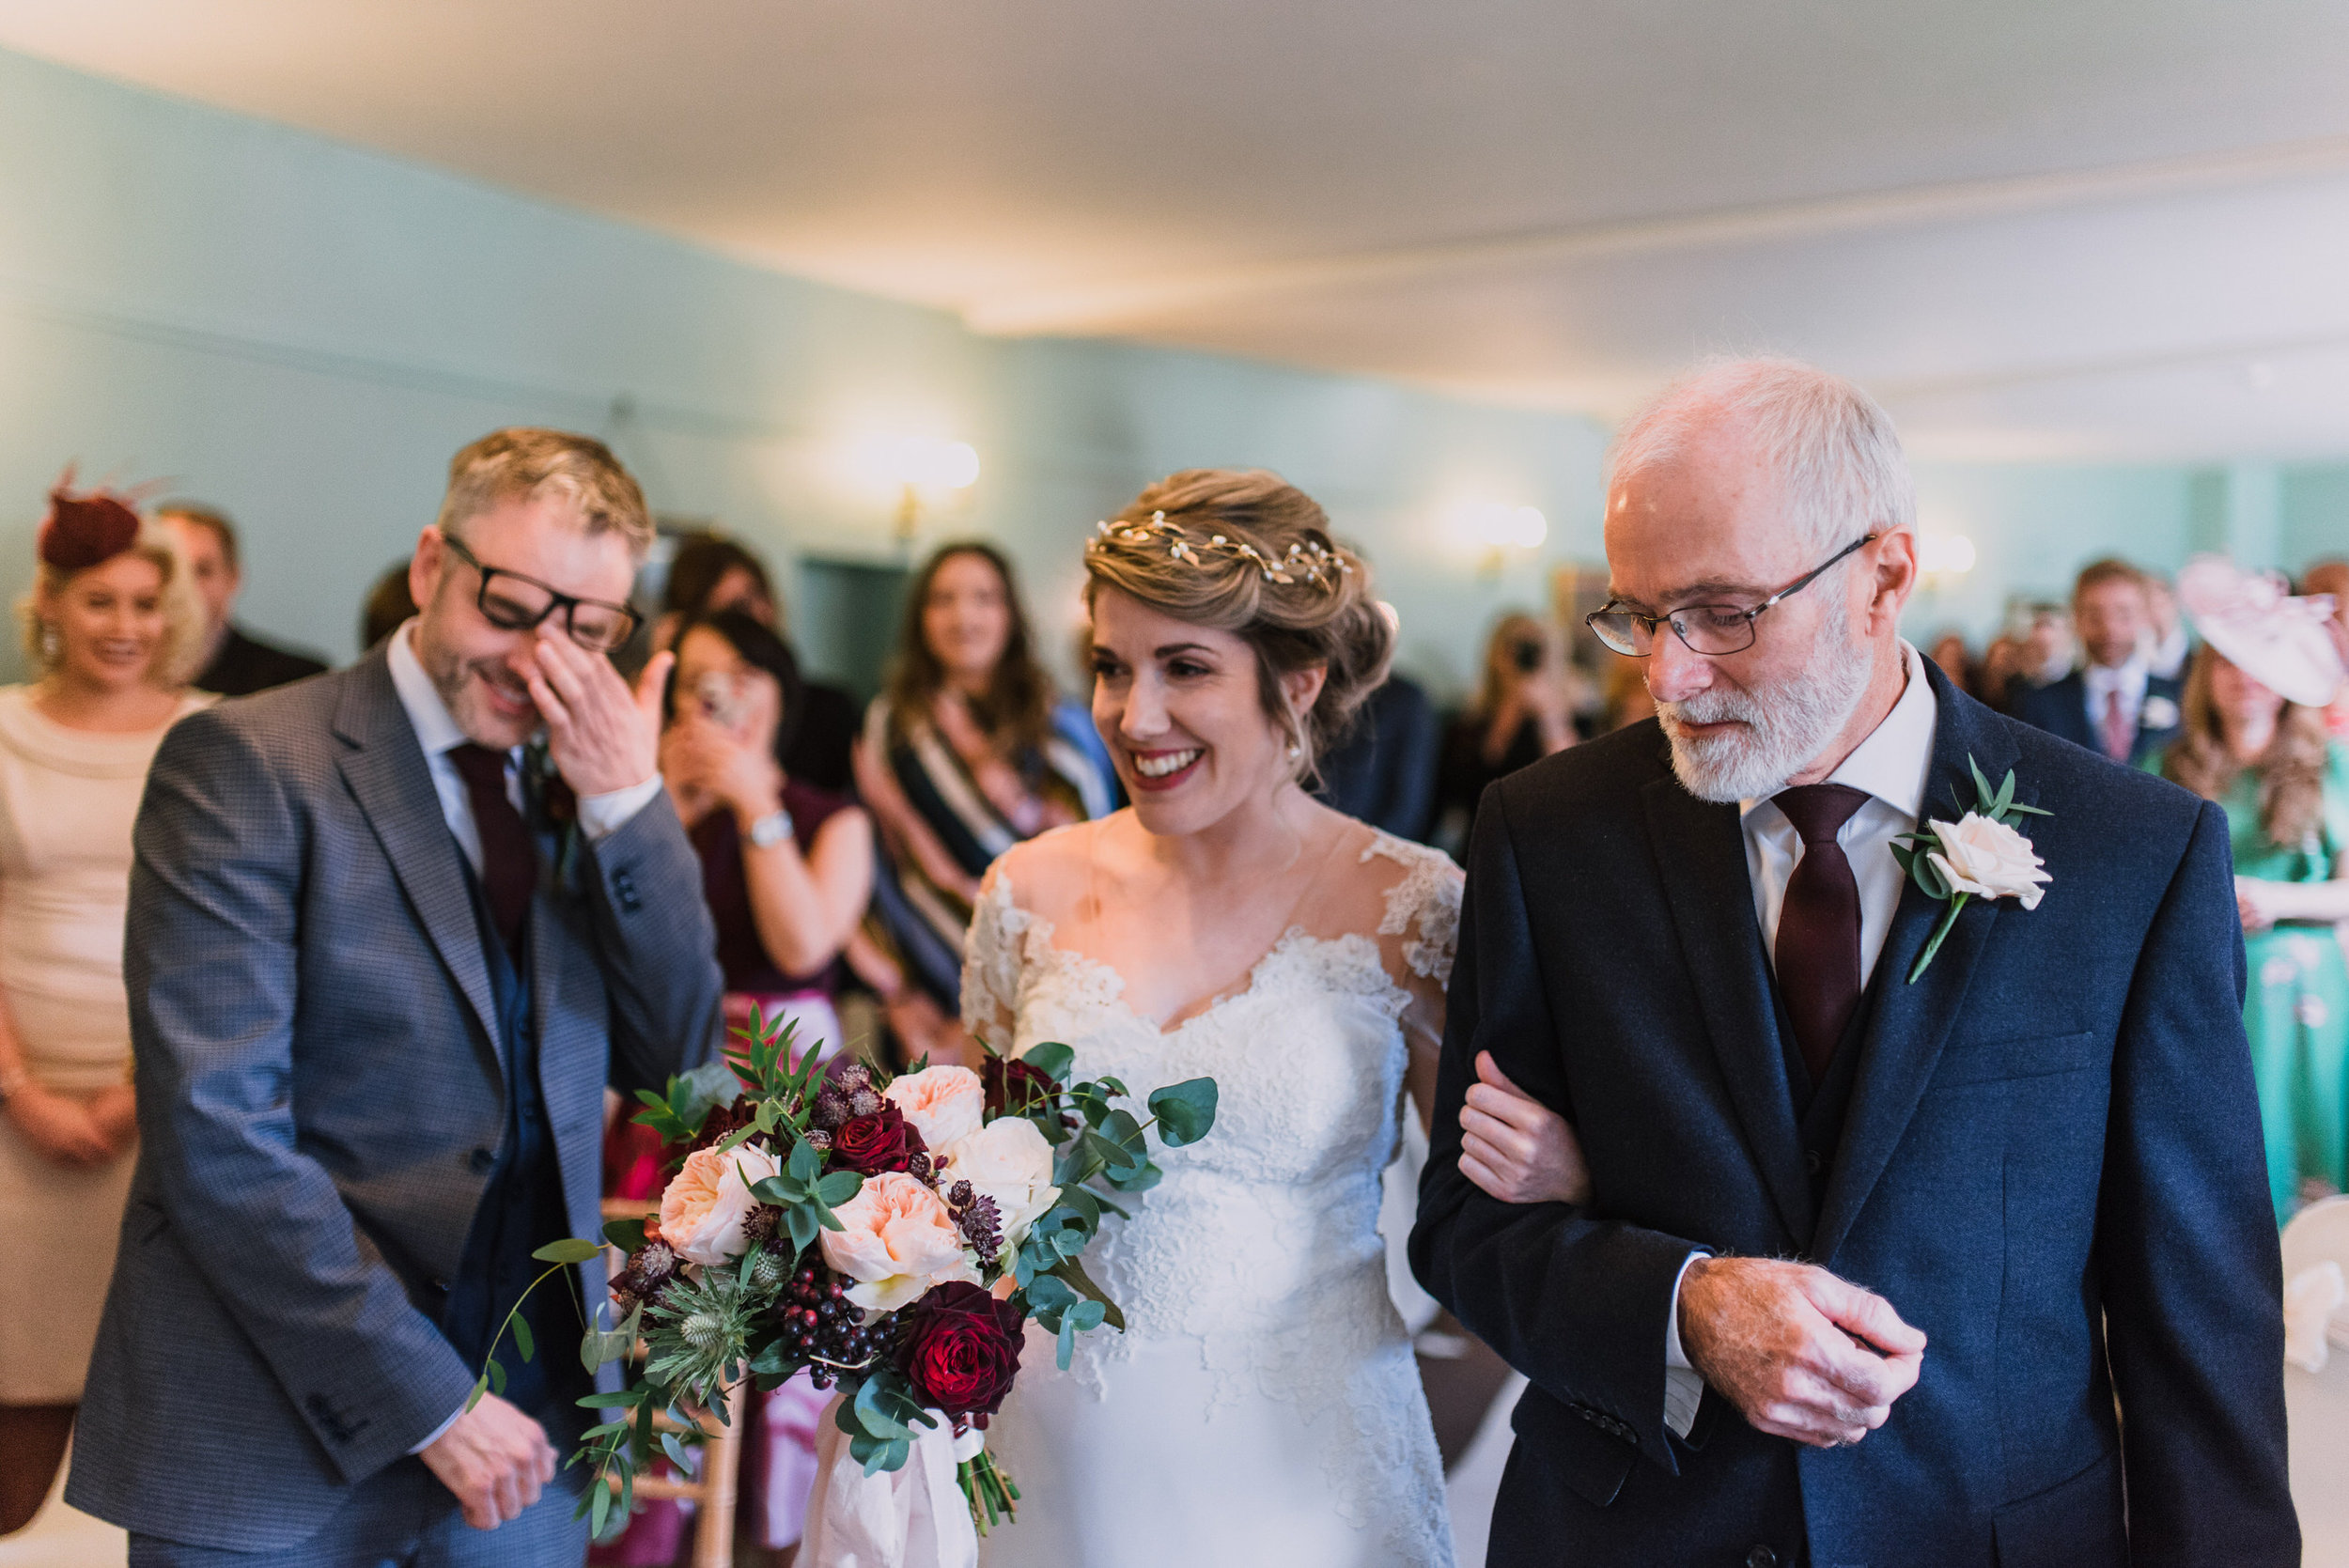 lissanoure castle wedding, northern ireland wedding photographer, romantic northern irish wedding venue, castle wedding ireland, natural wedding photography ni (49).jpg